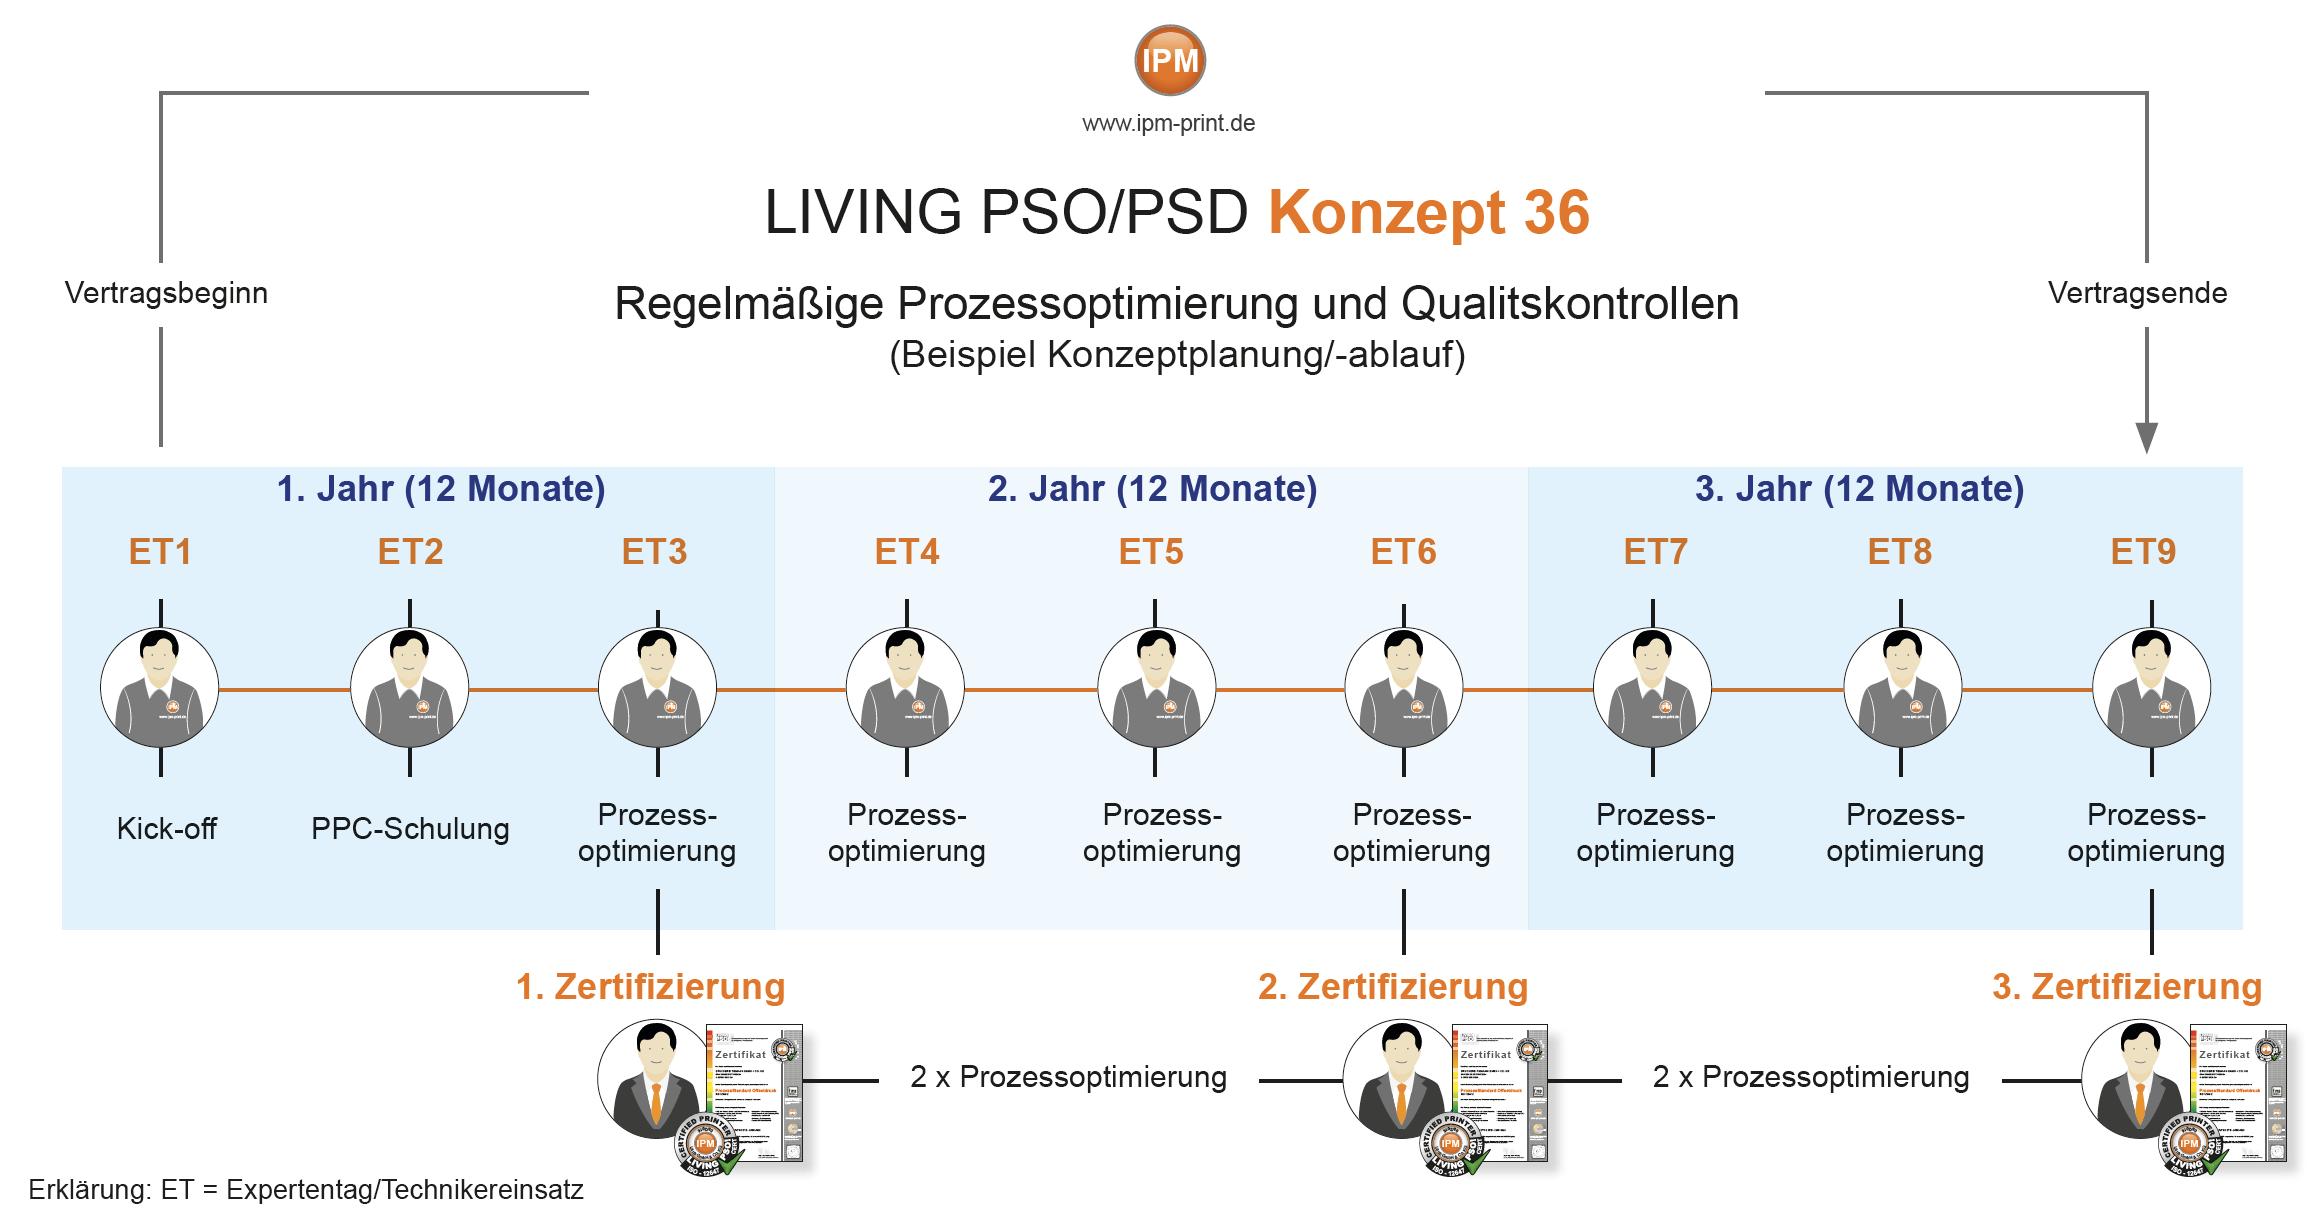 LivingPSO-Konzept36-Übersicht